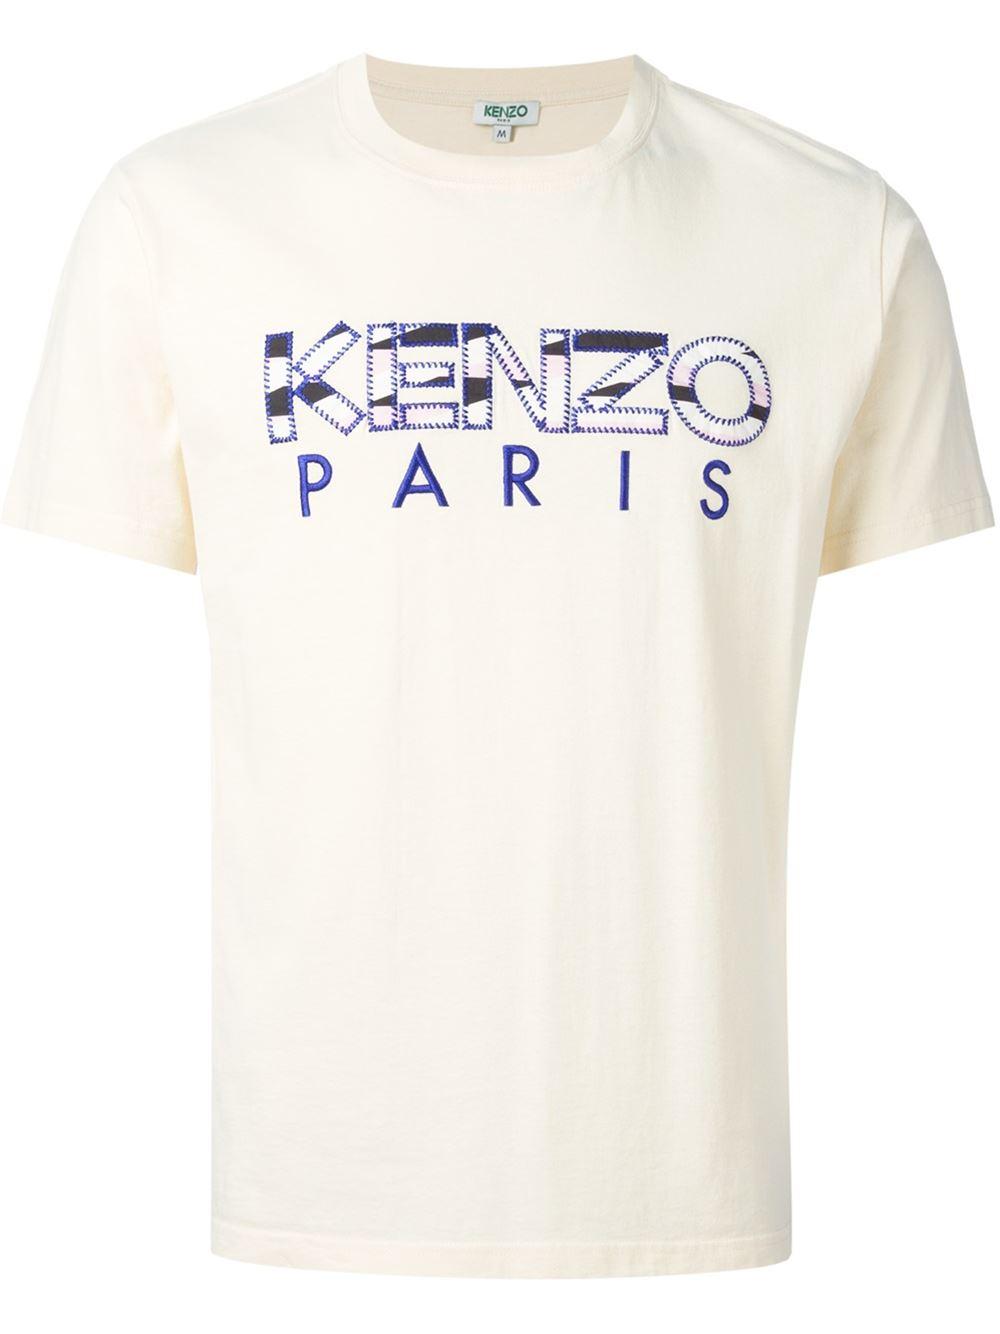 c459c6b1a313 Lyst - KENZO   Paris  T-Shirt in Yellow for Men